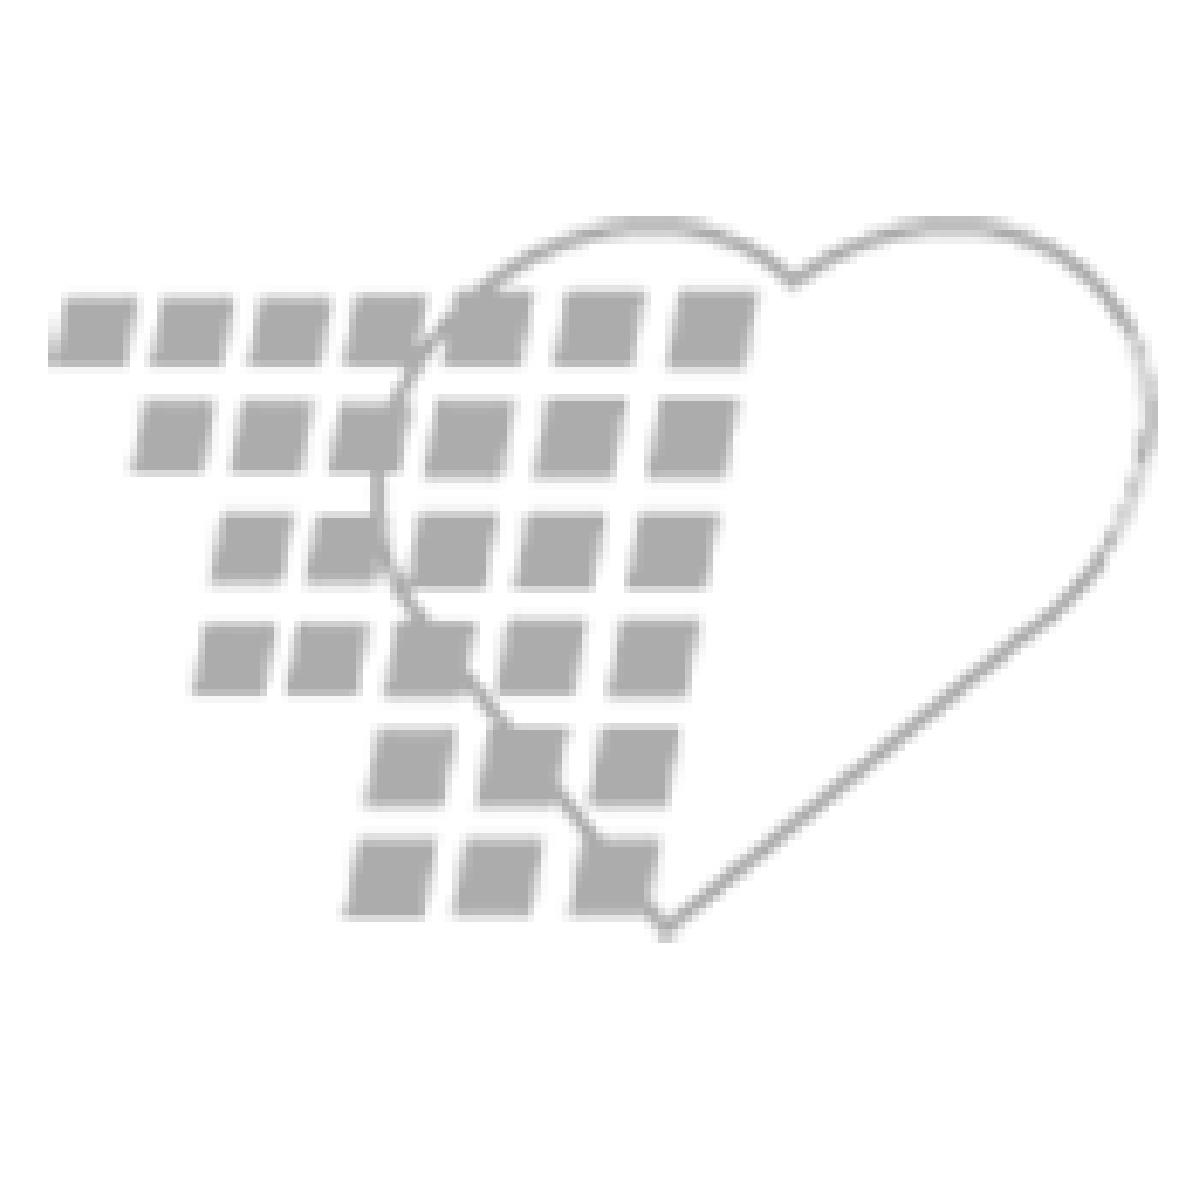 02-87-7012 Urocheck Urine Strips - 2 Parameter